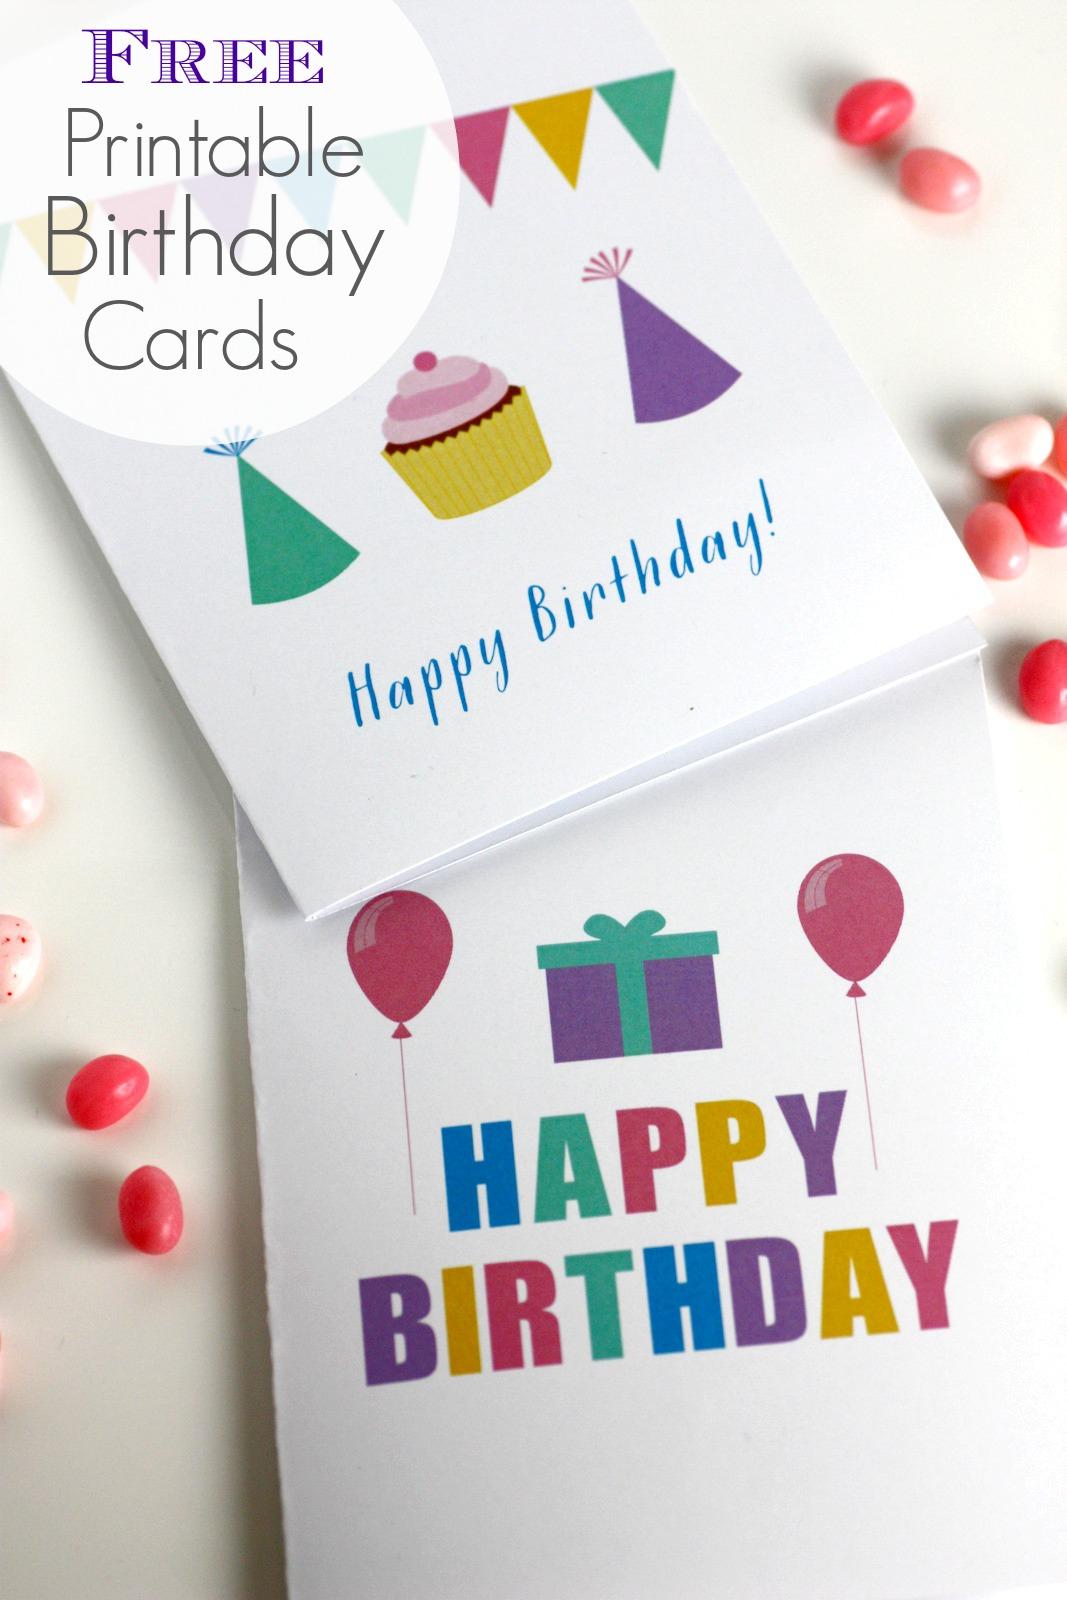 Free Printable Blank Birthday Cards   Catch My Party - Free Printable Birthday Cards For Boys